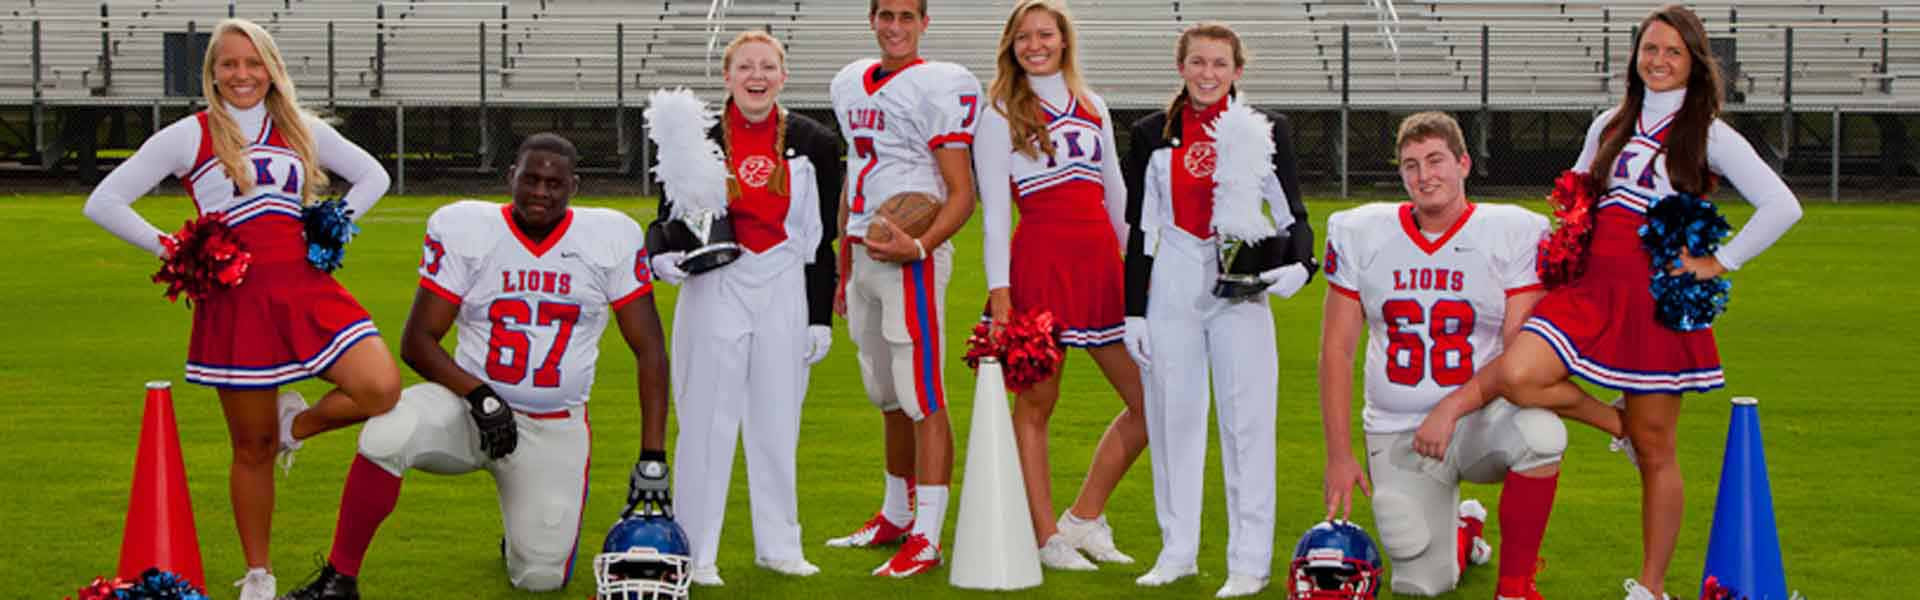 Kingsacademy-highschool-FL-Football-MAin-Banner